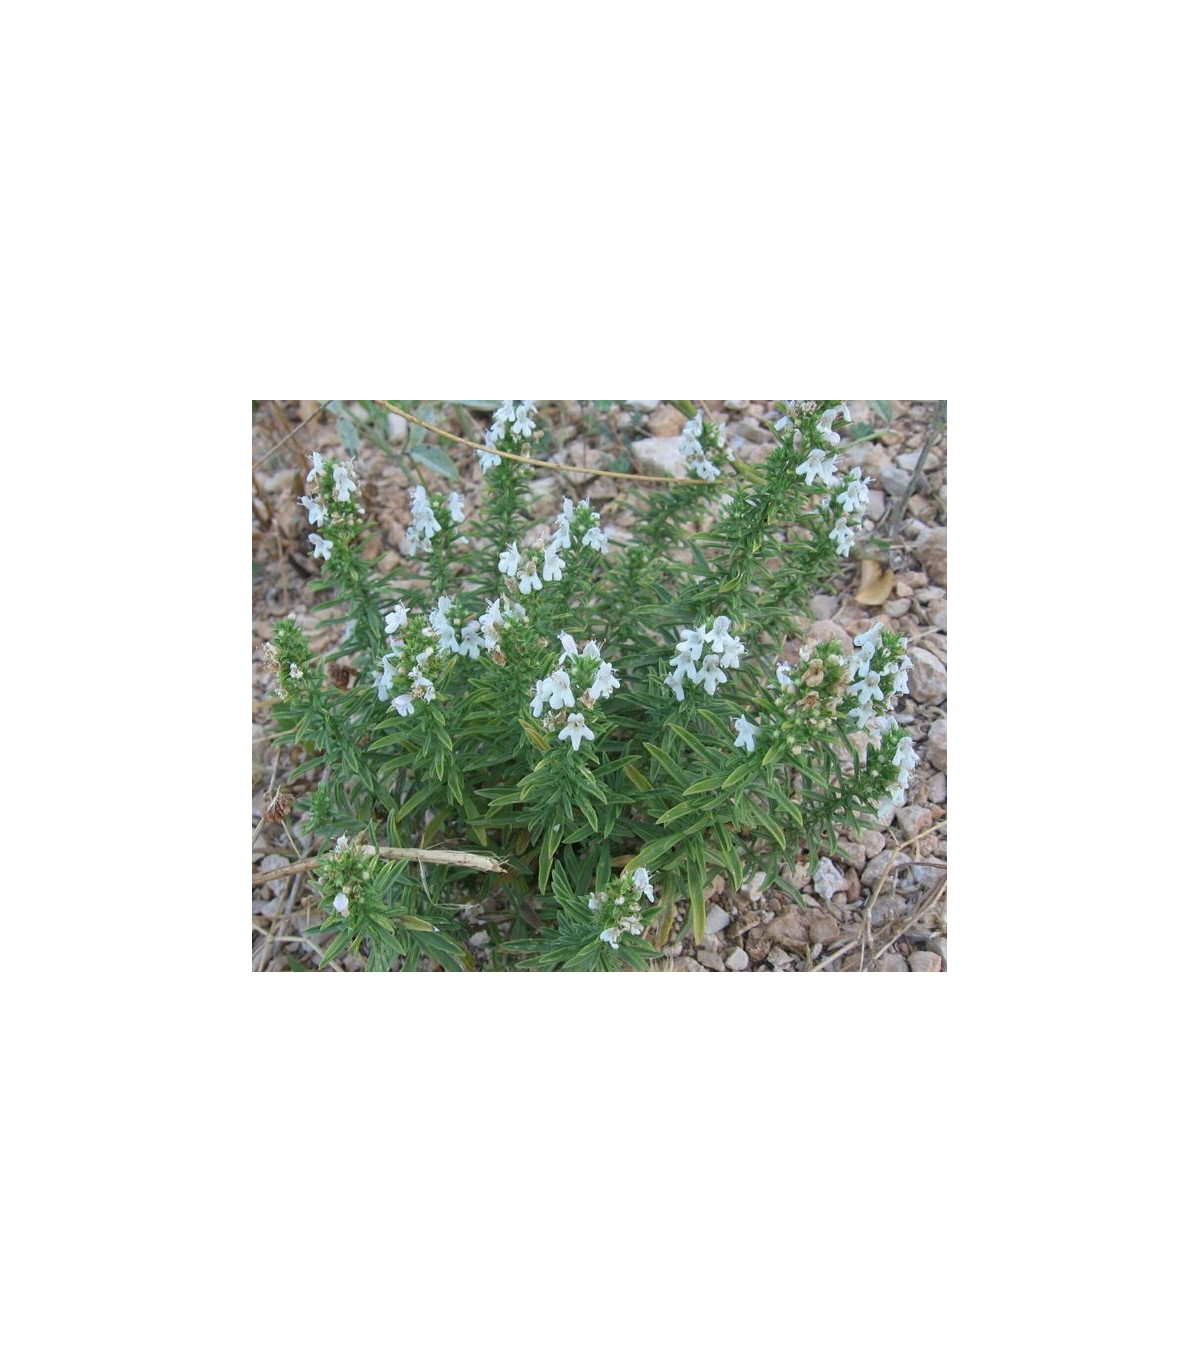 Bio saturejka horská - semená saturejky - semiačka - 0,3 gr